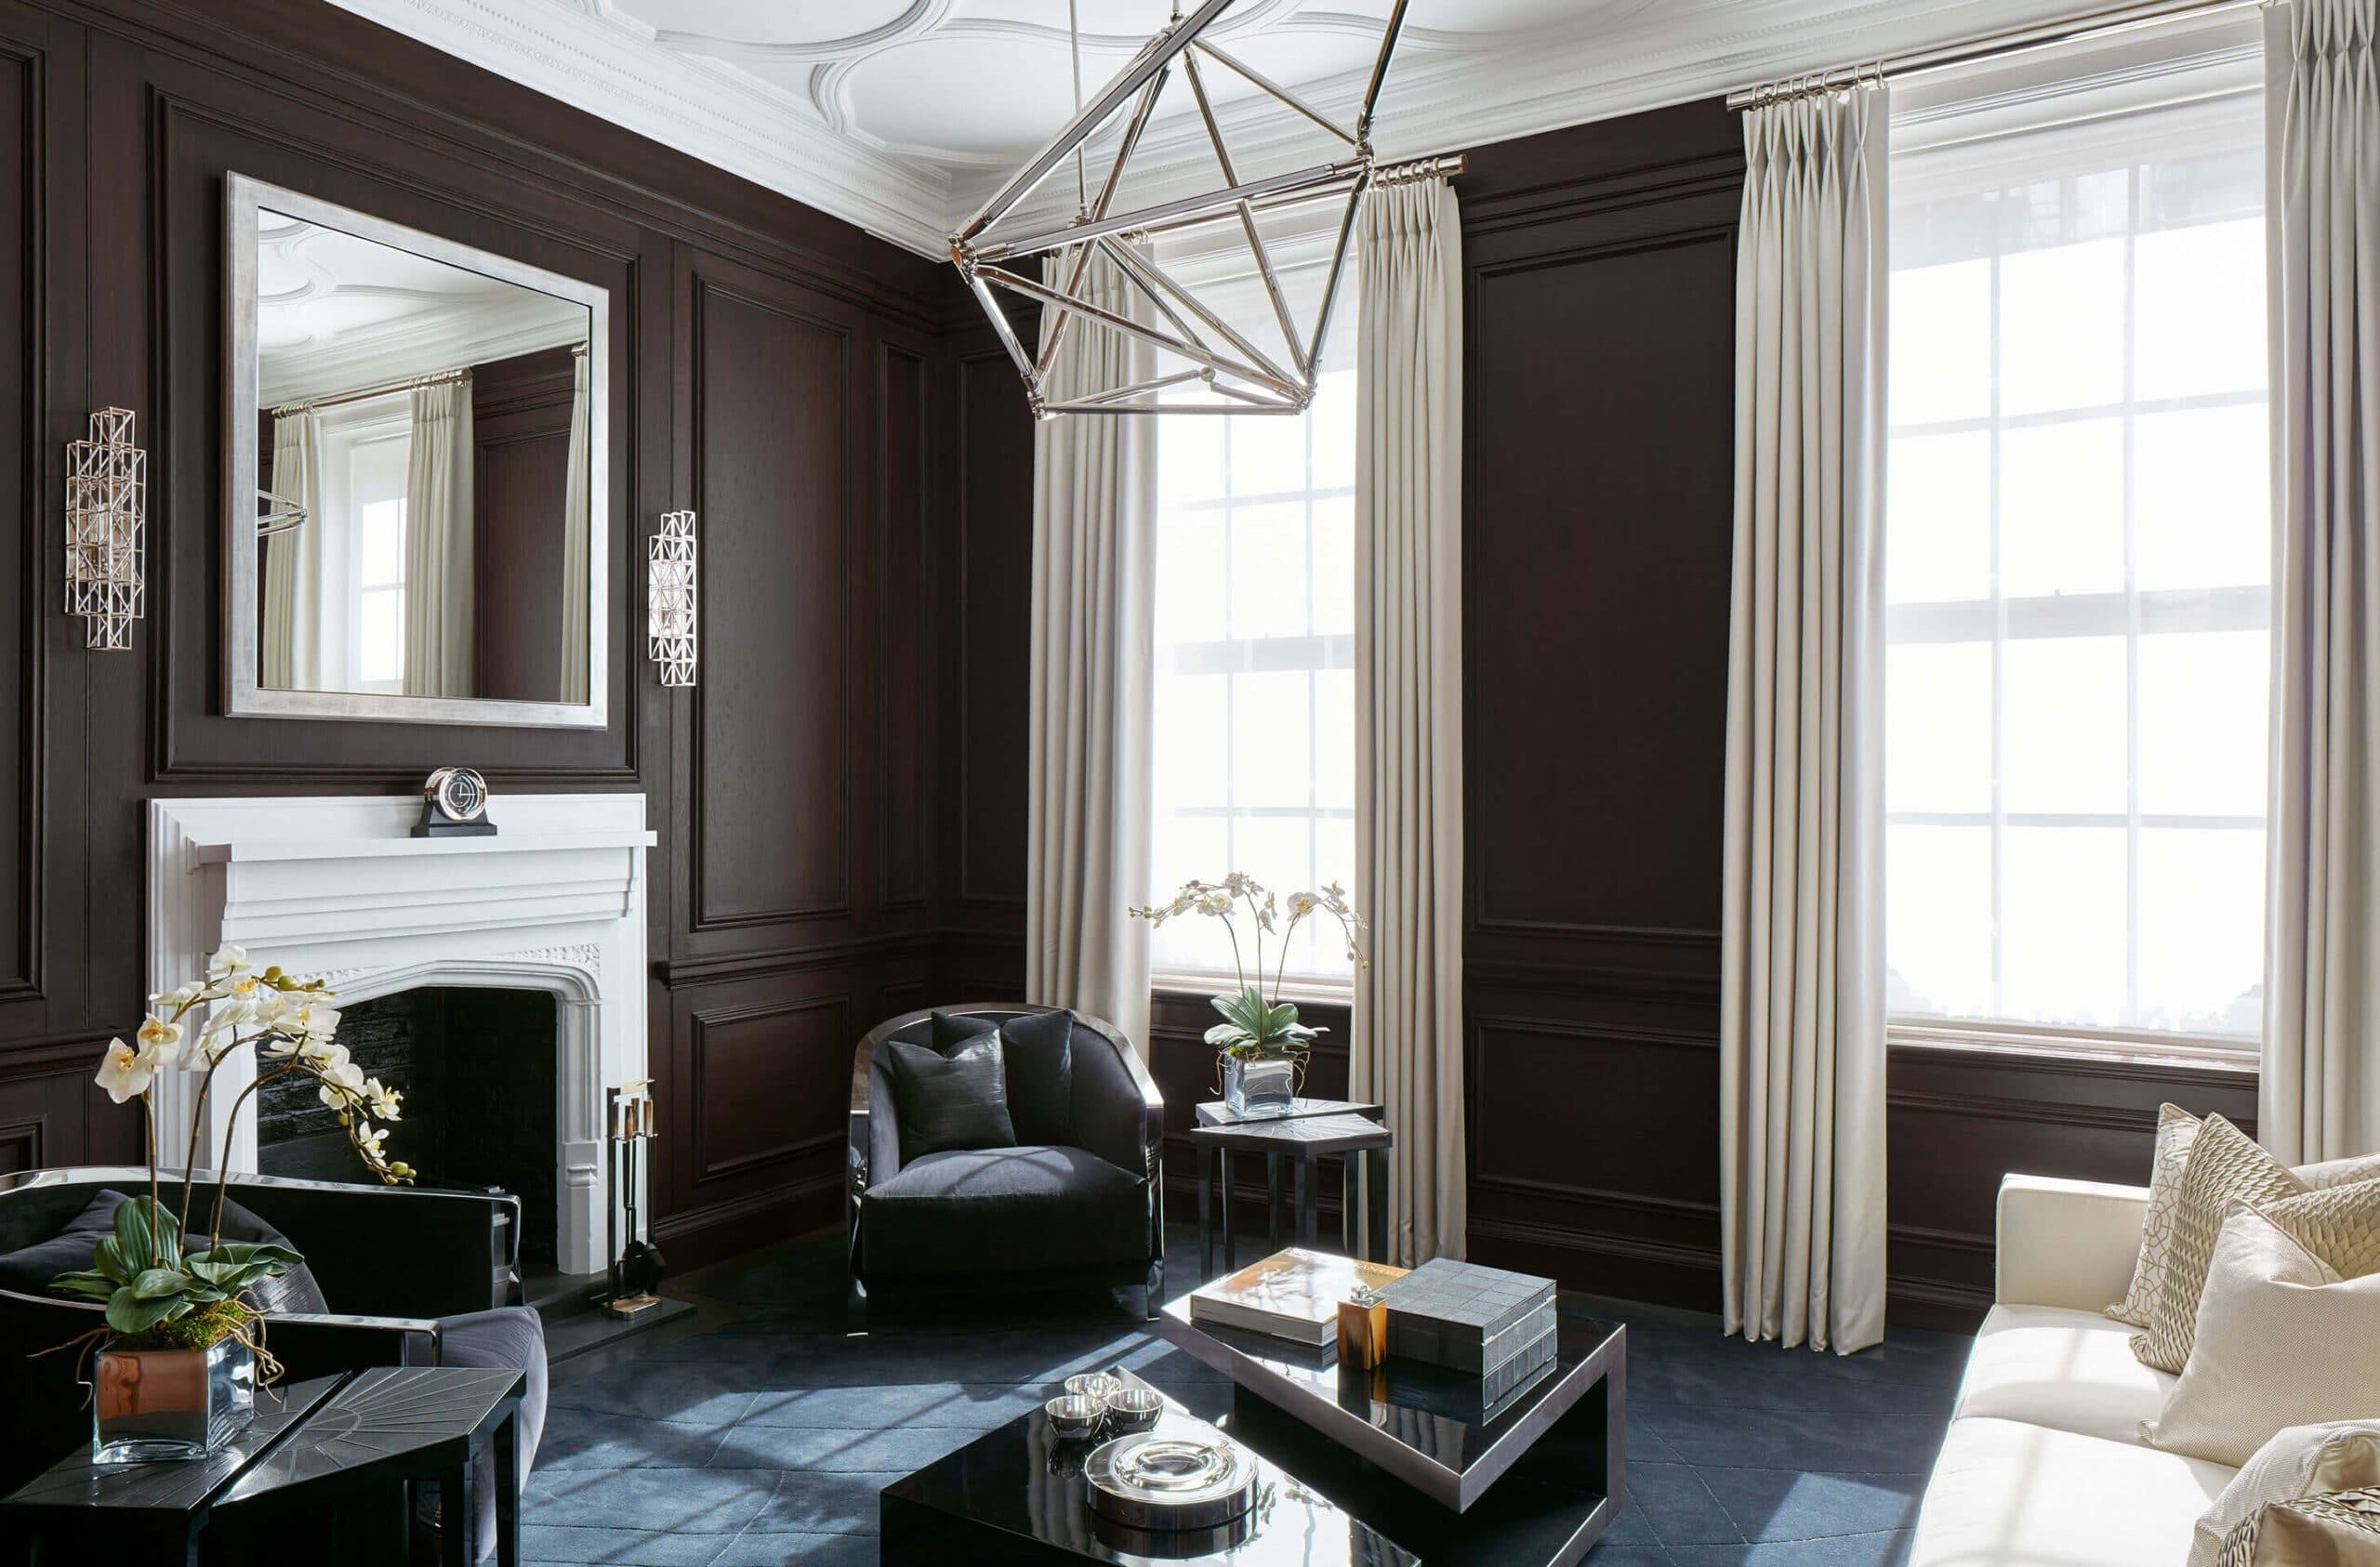 Mayfair interior designer Katharine Pooley